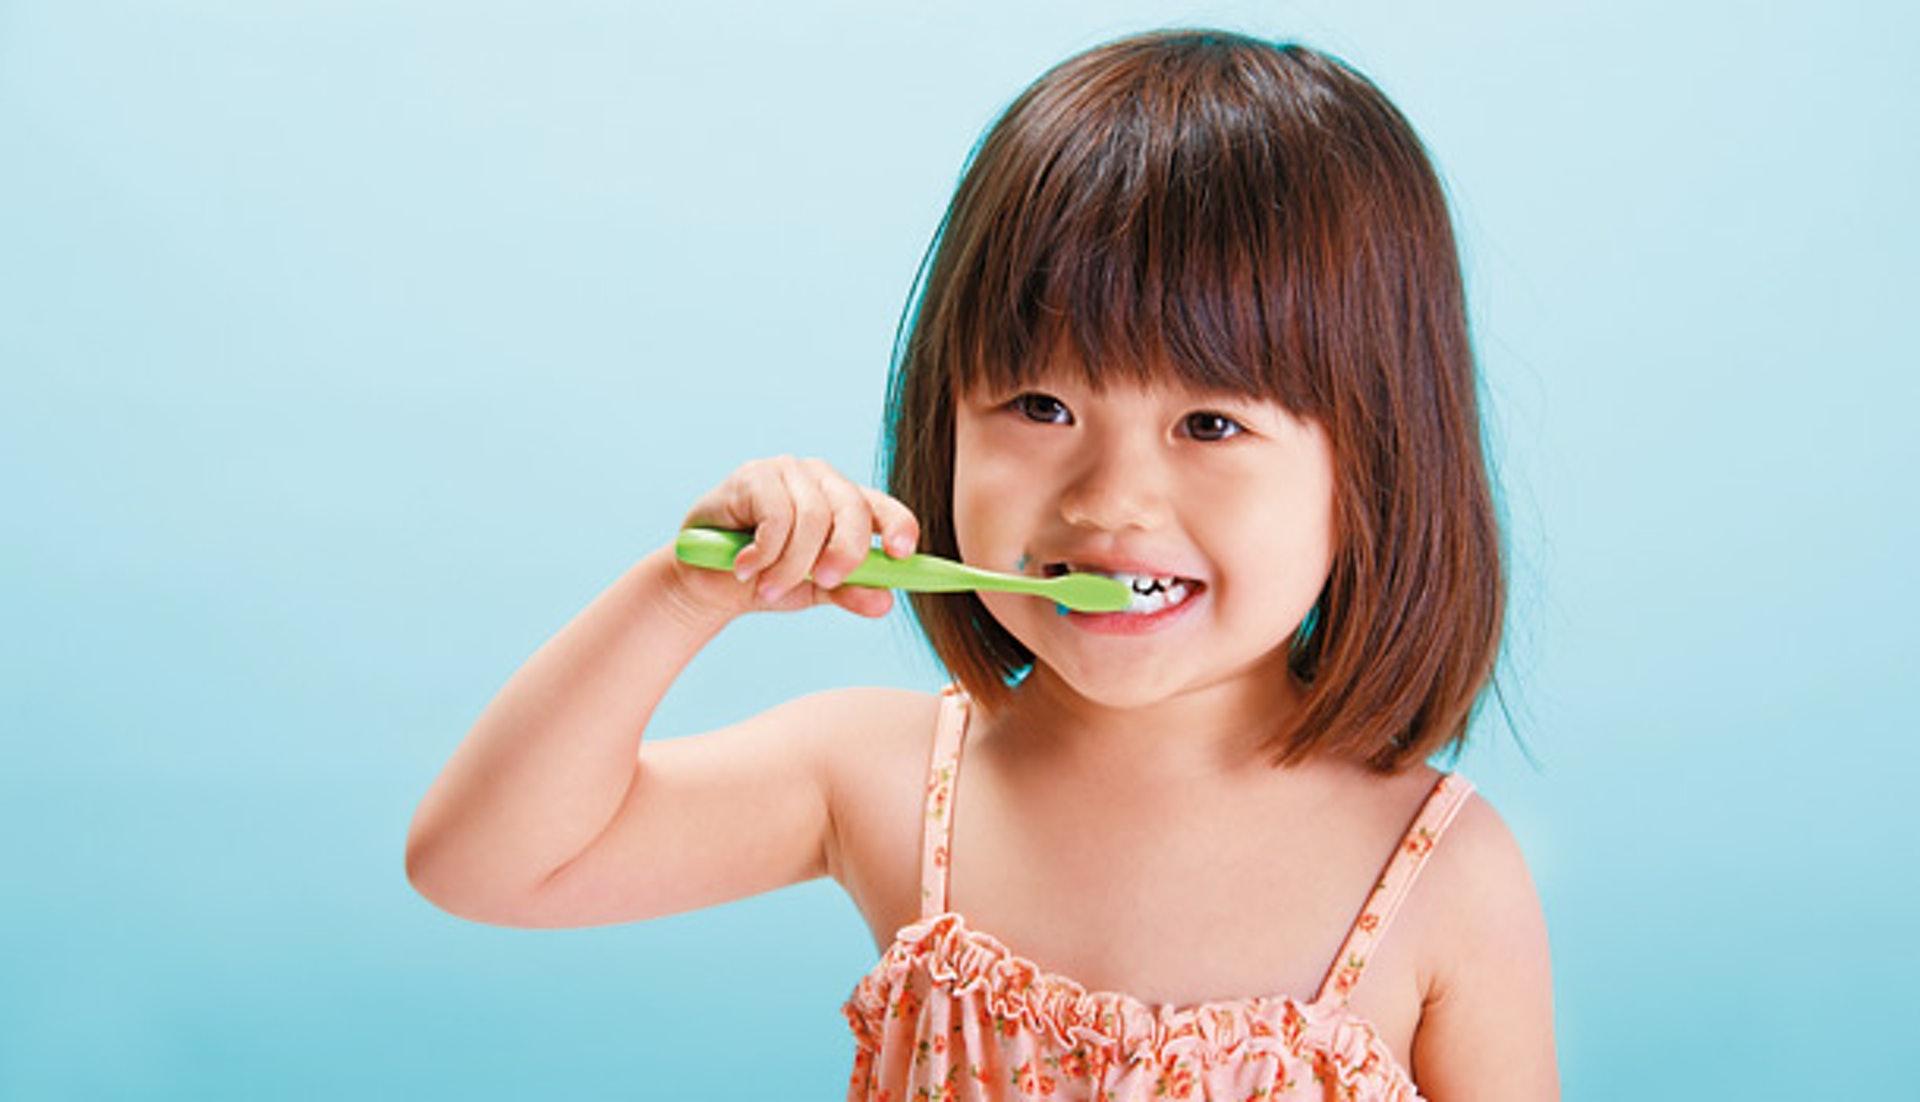 小朋友應從小培養正確的刷牙觀念。(圖片:Common health)